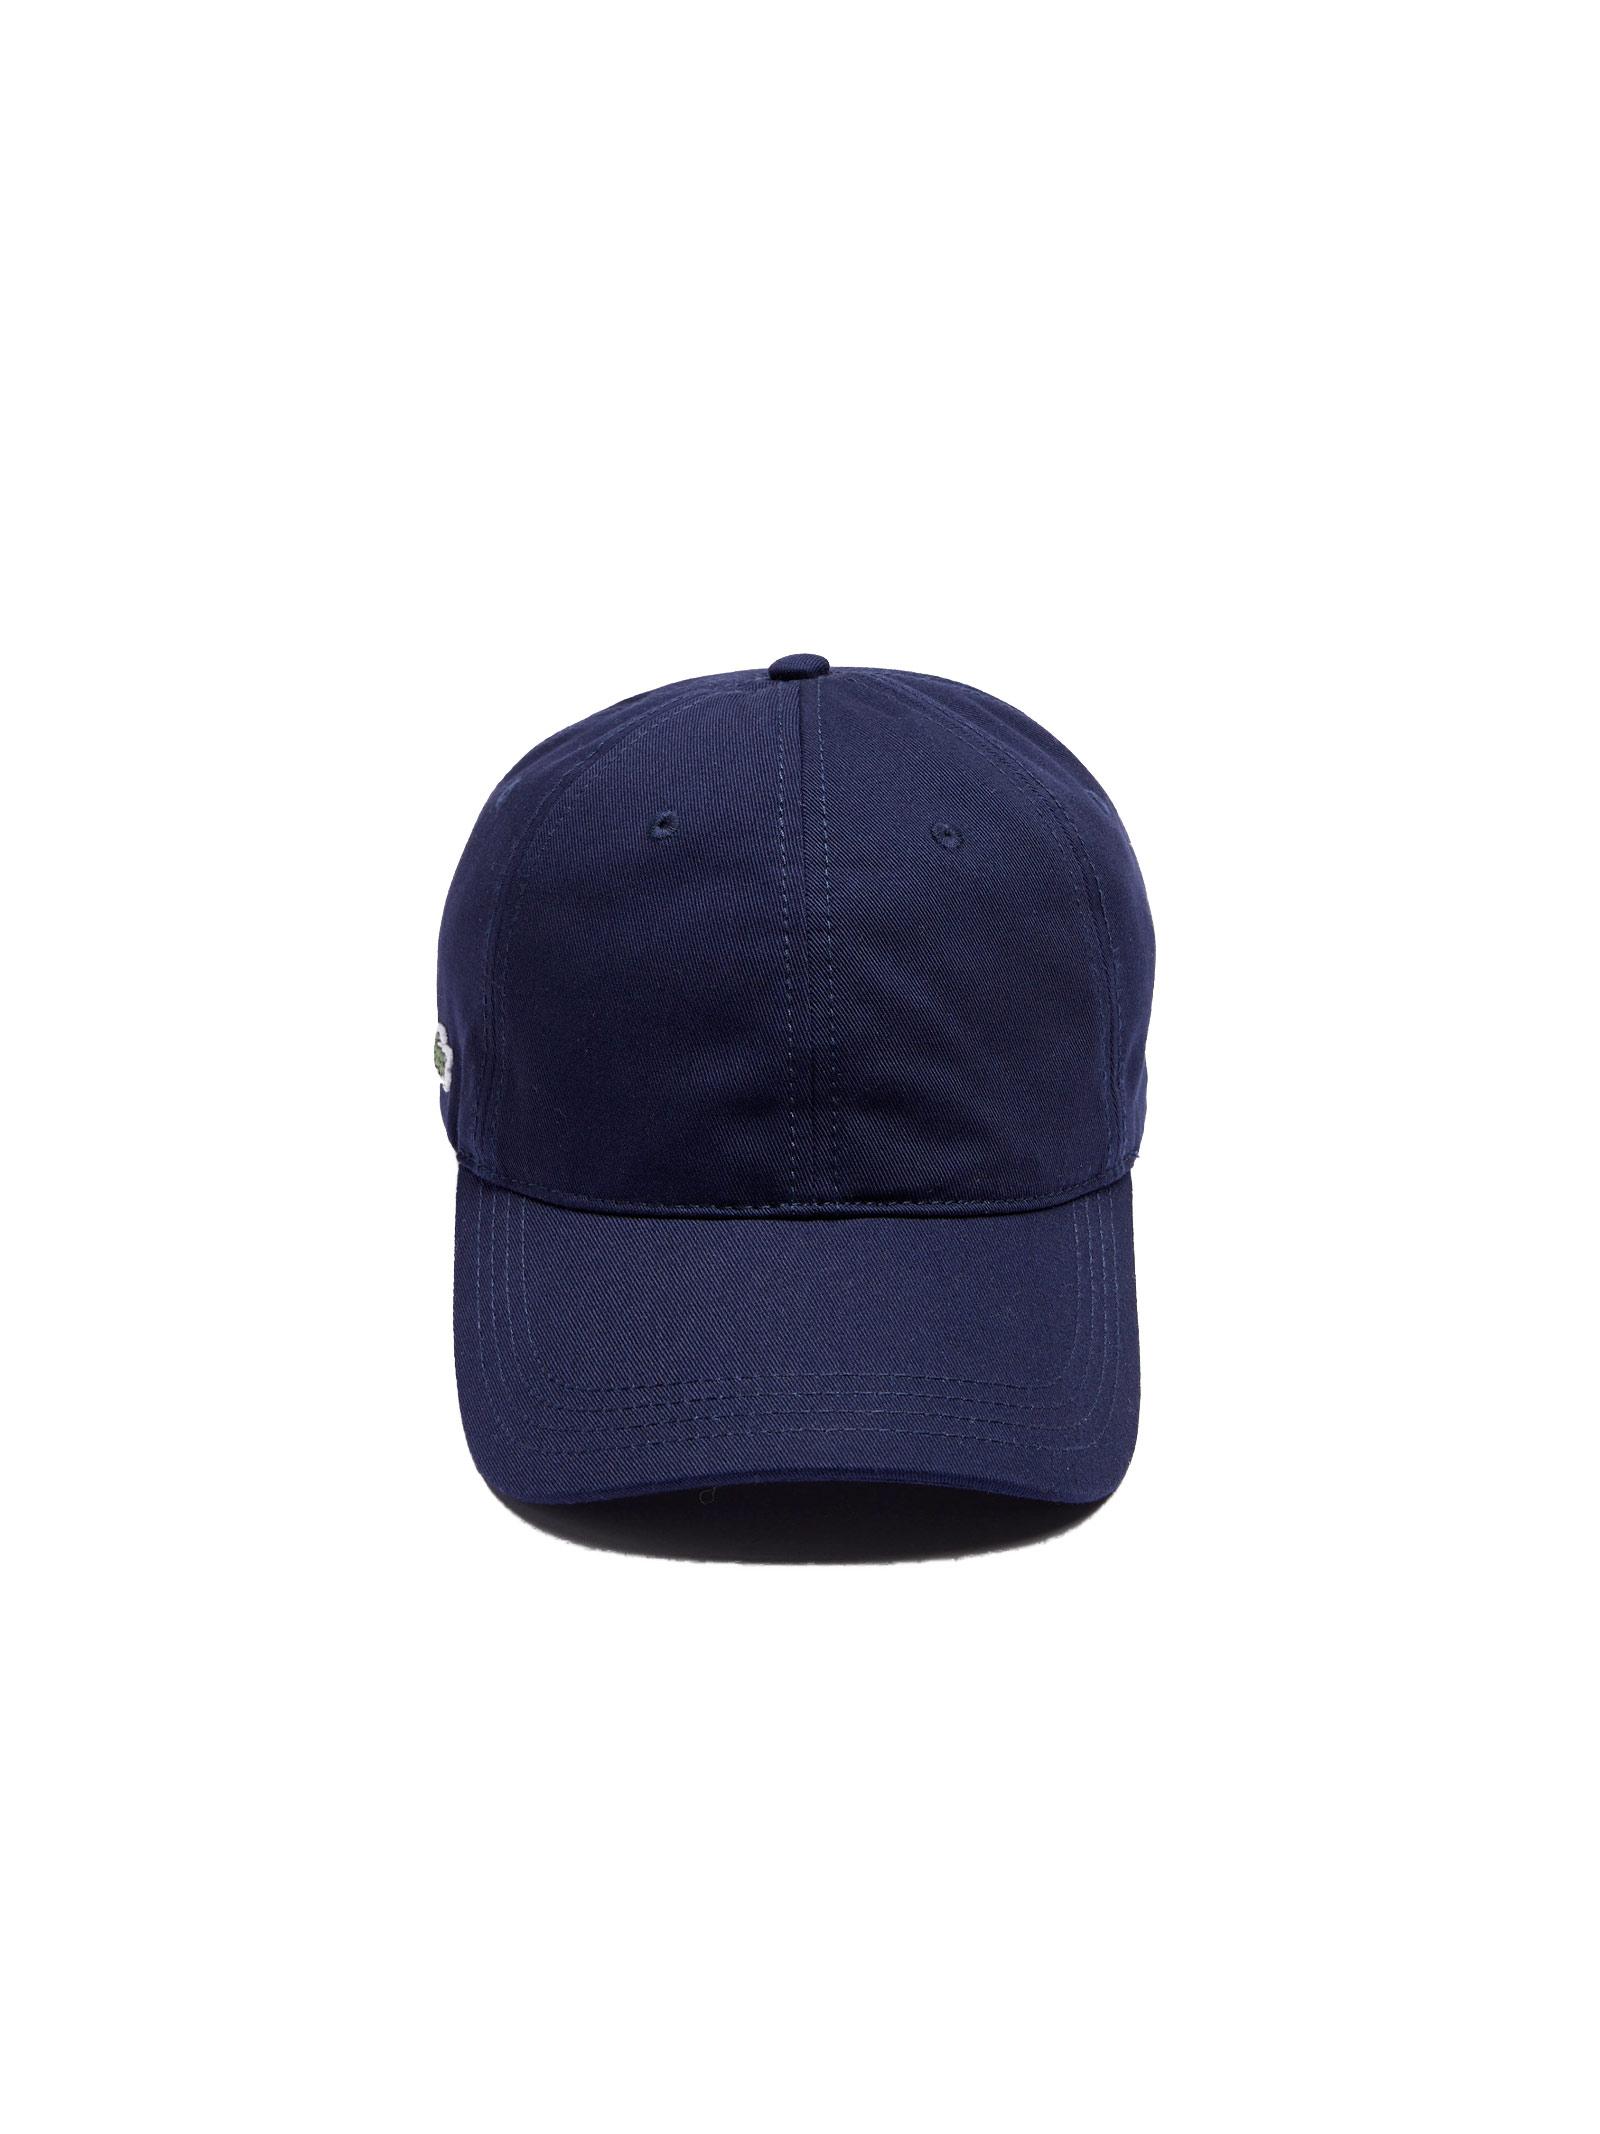 Cappelllo in cotone blu navy LACOSTE | Cappello | RK4709166